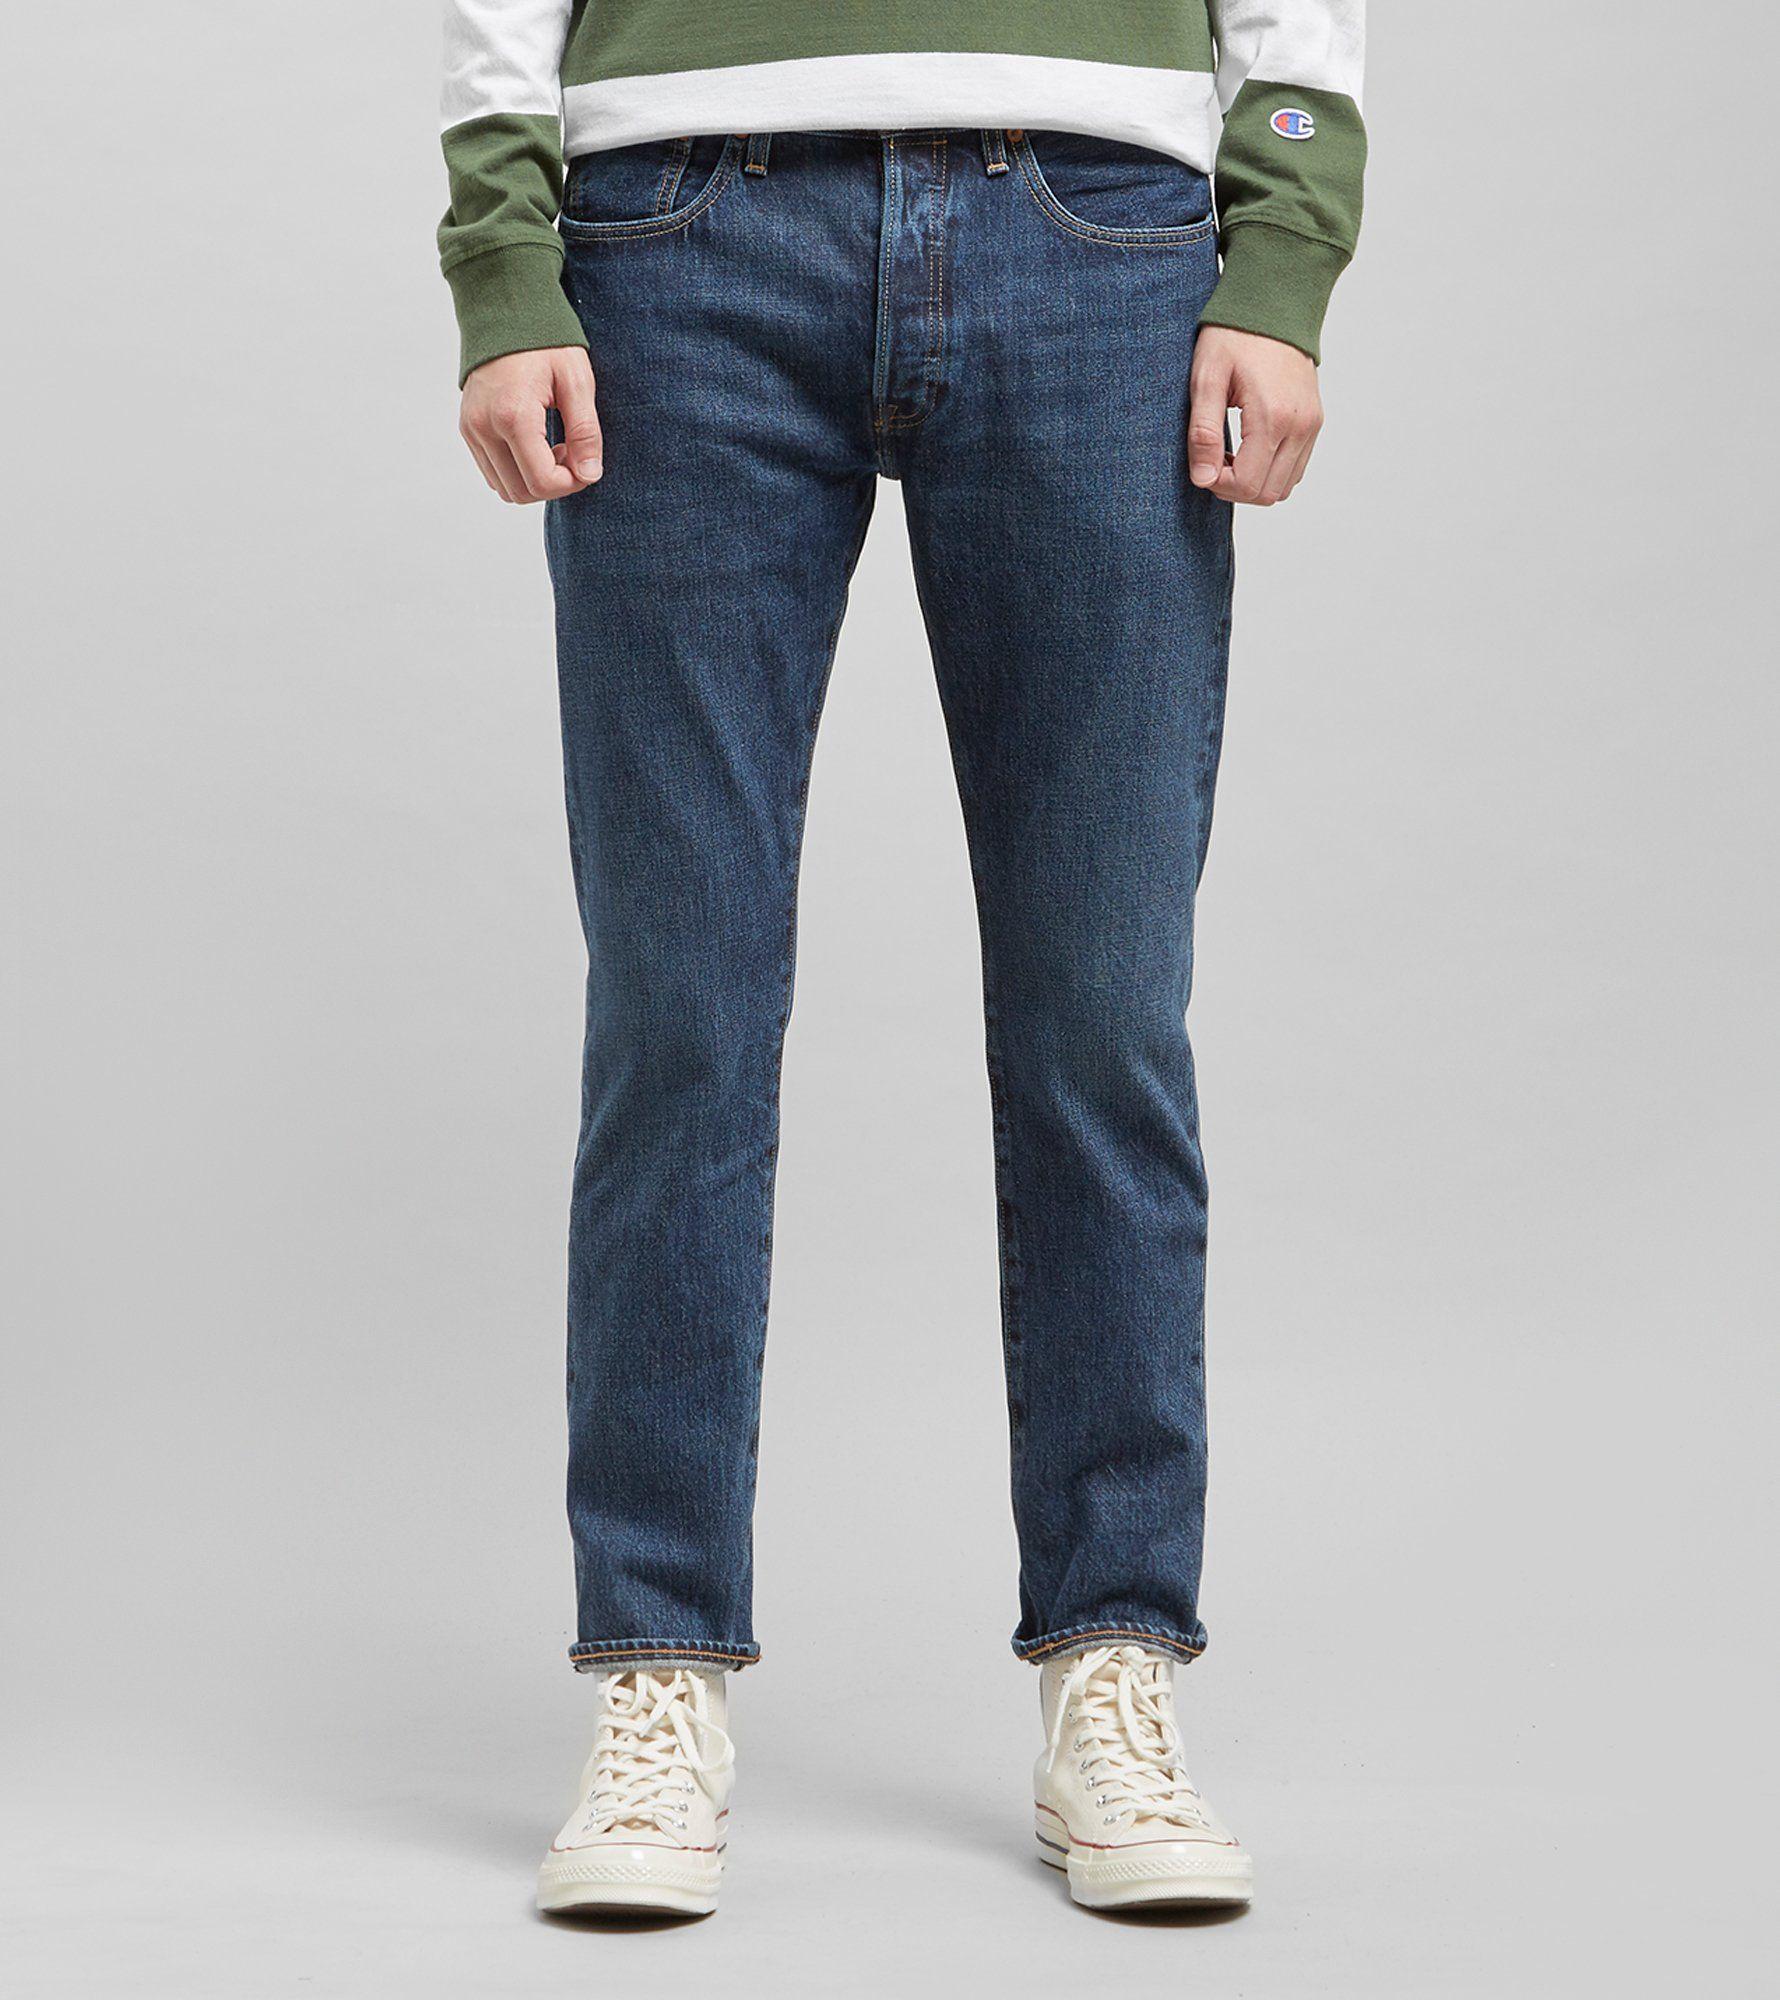 Levis 501 Skinny Warp Stretch Jeans